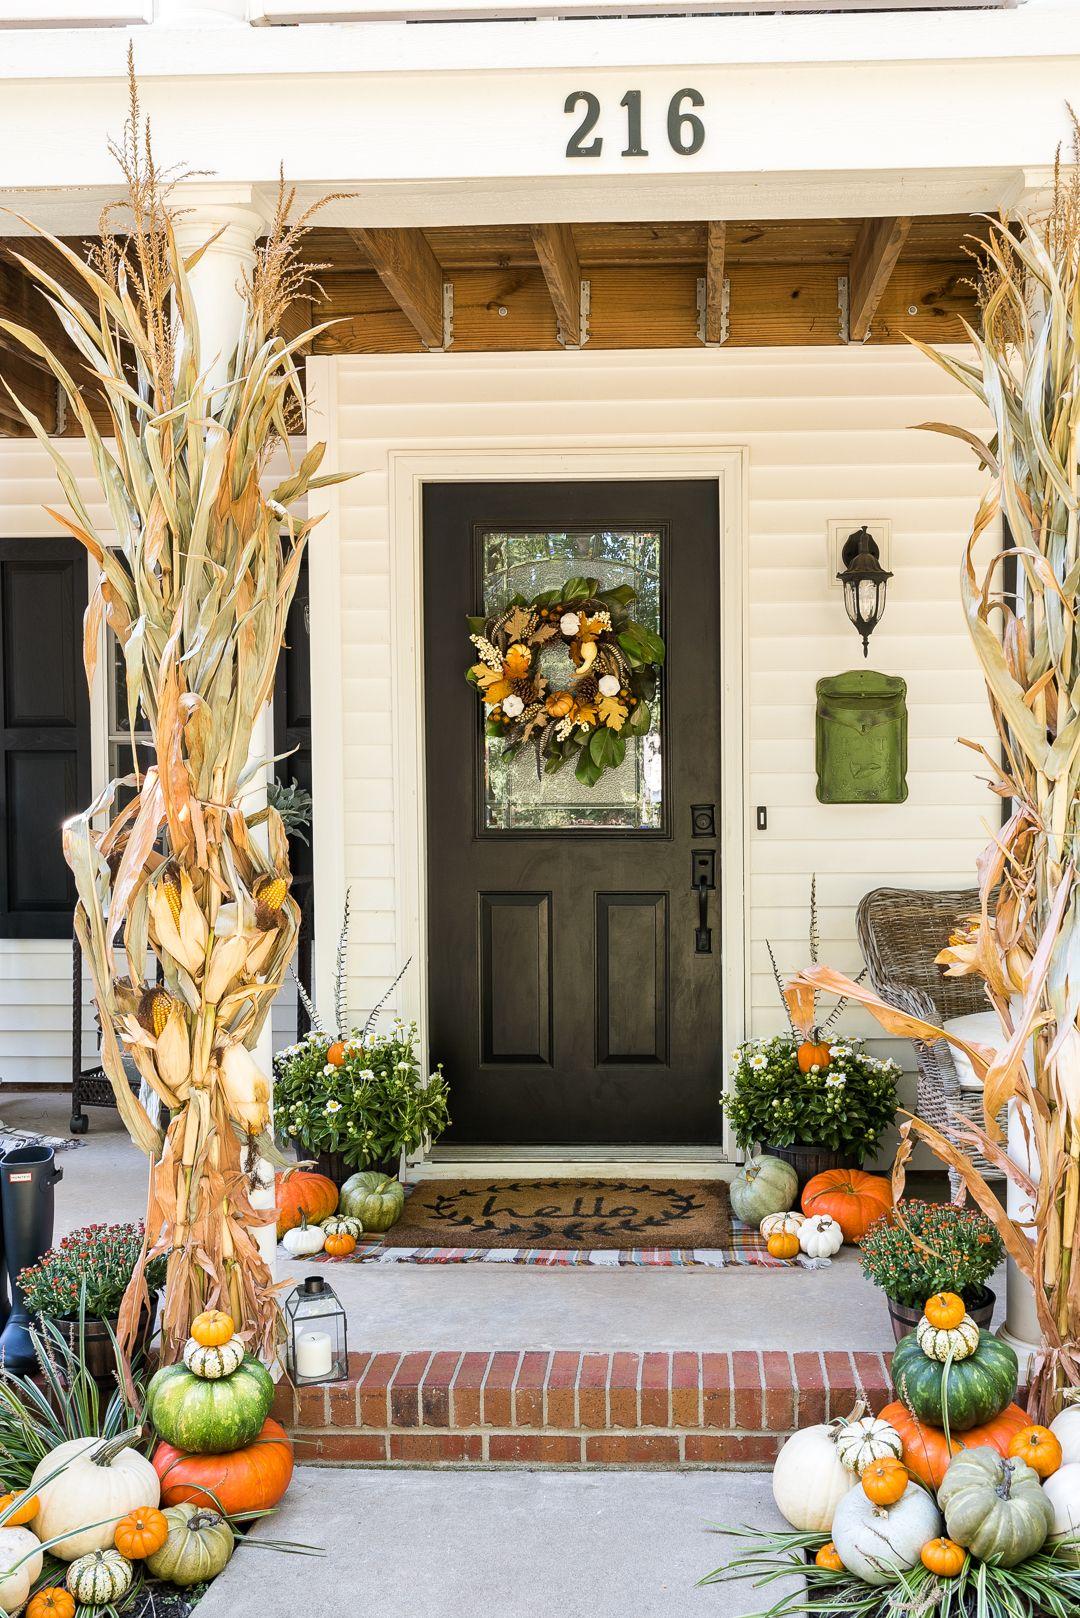 Traditional Fall Porch Fall Decorations Porch Fall Outdoor Decor Fall Porch